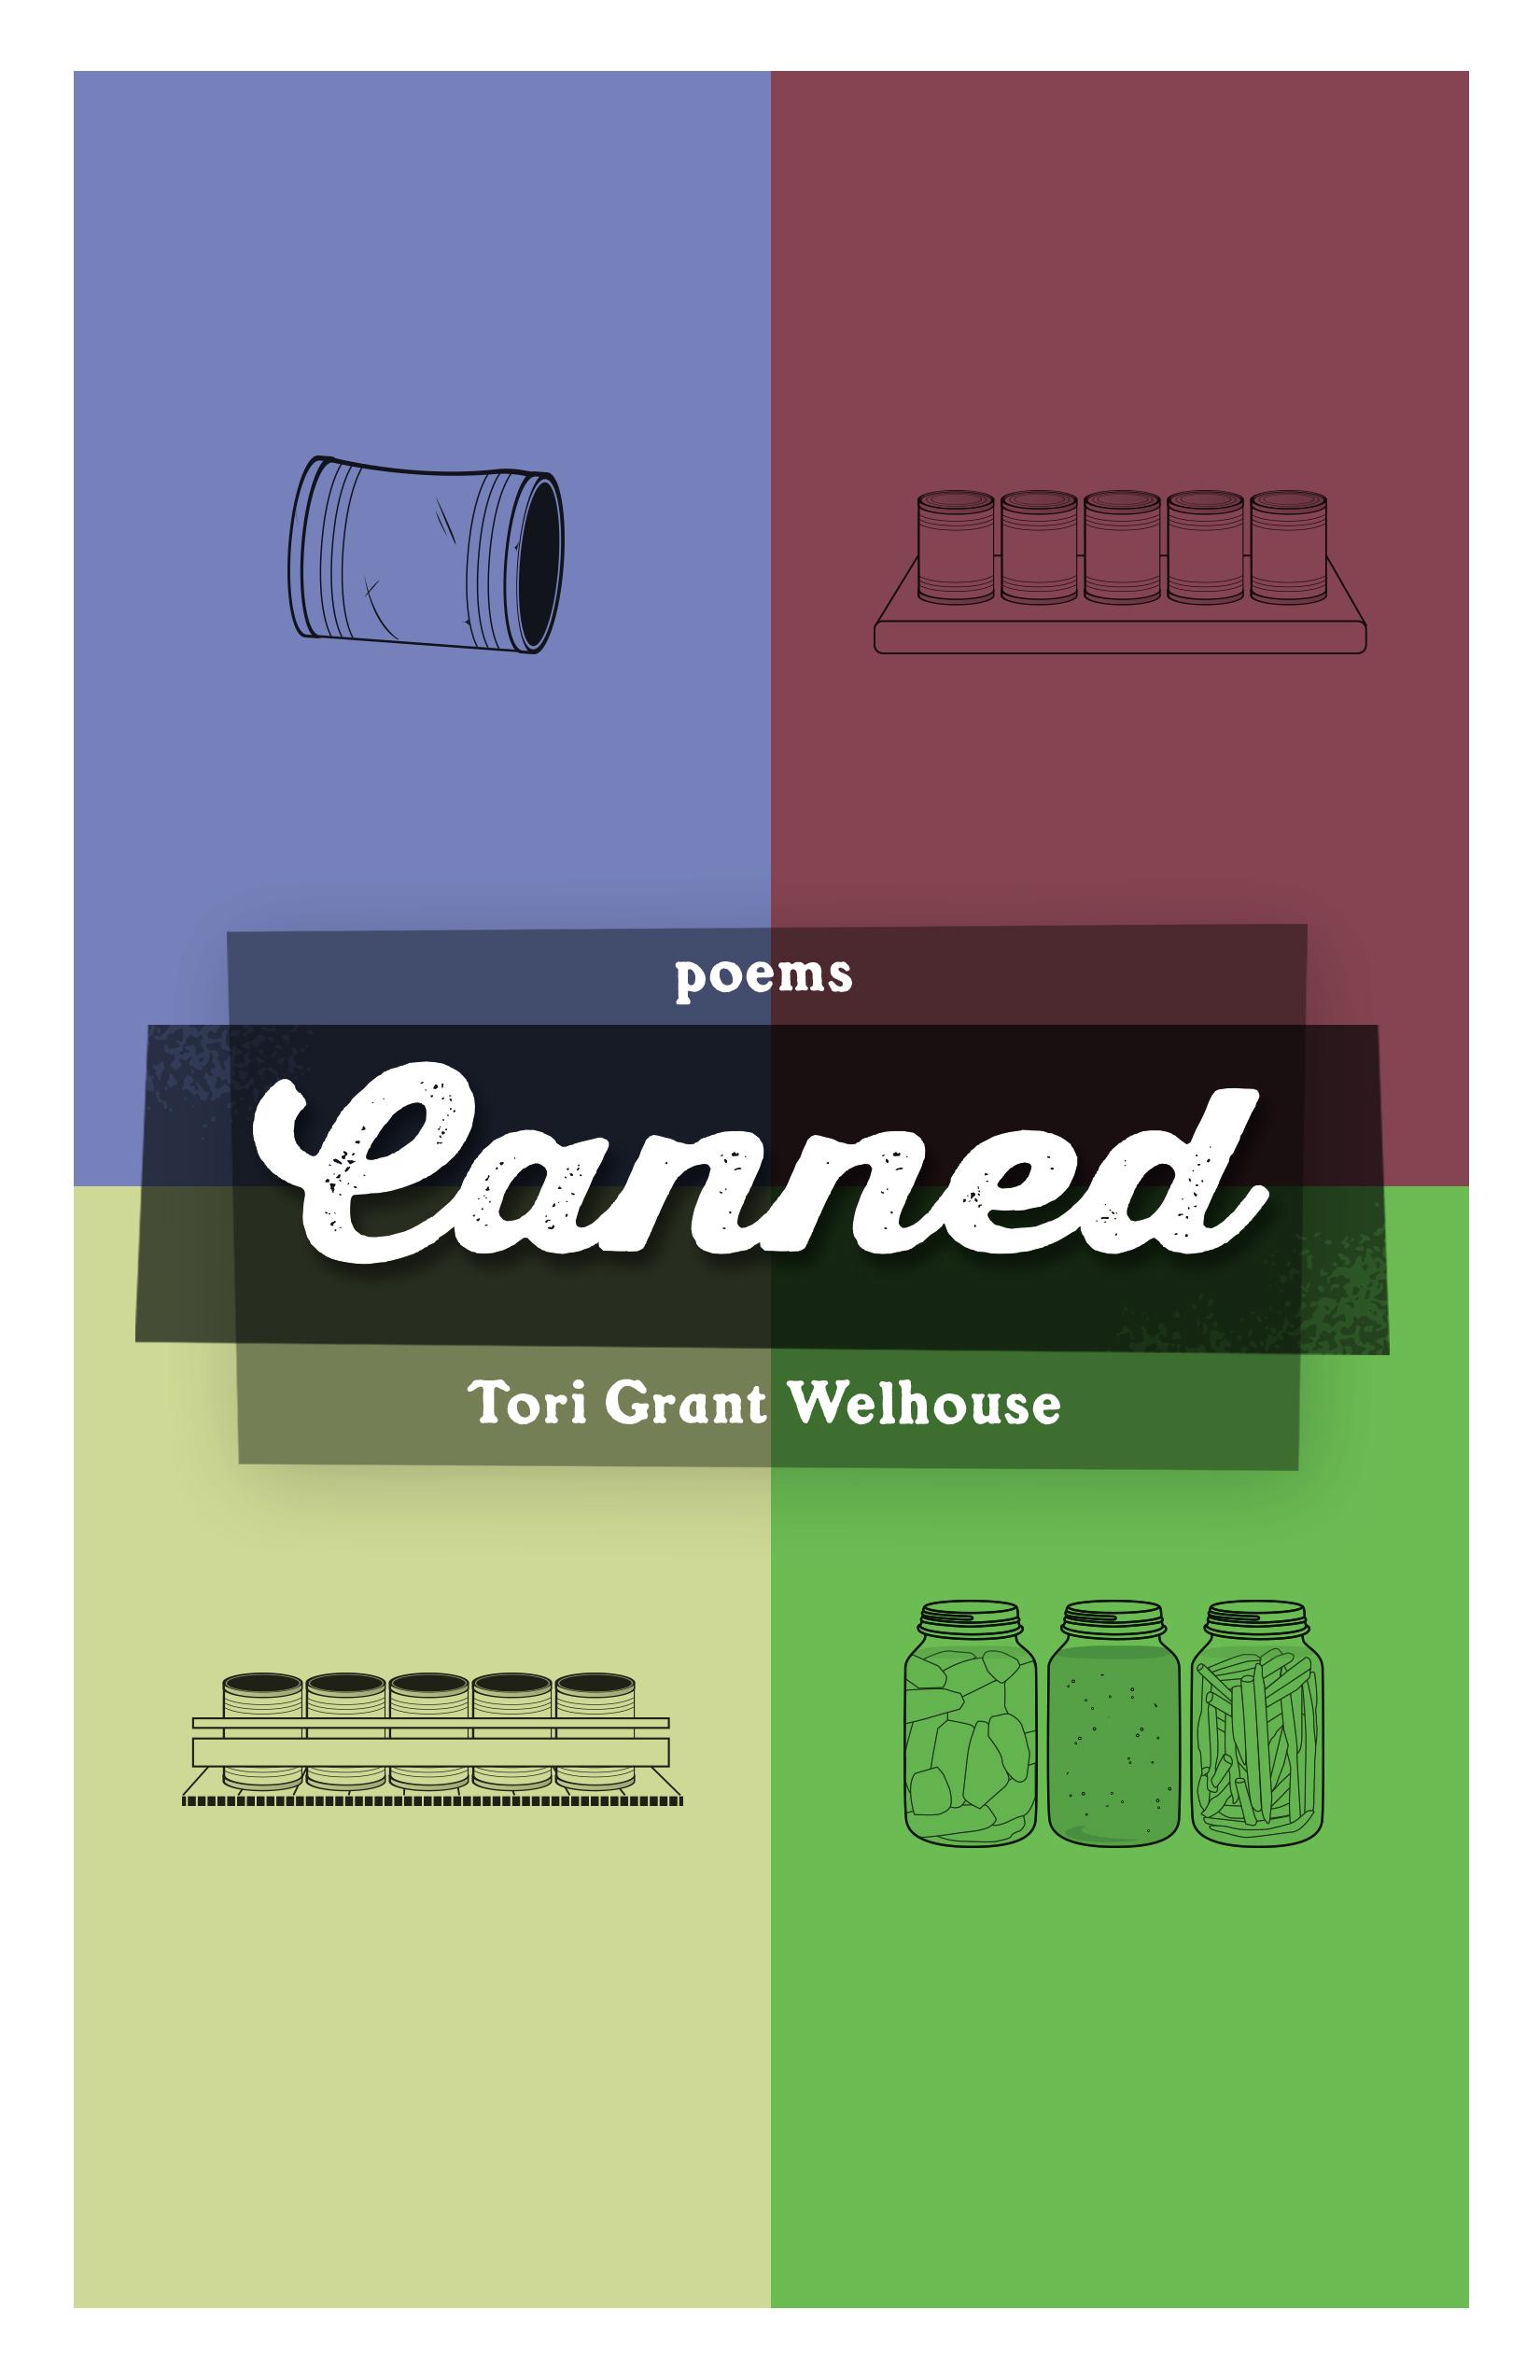 Cover Art - Canned.jpg